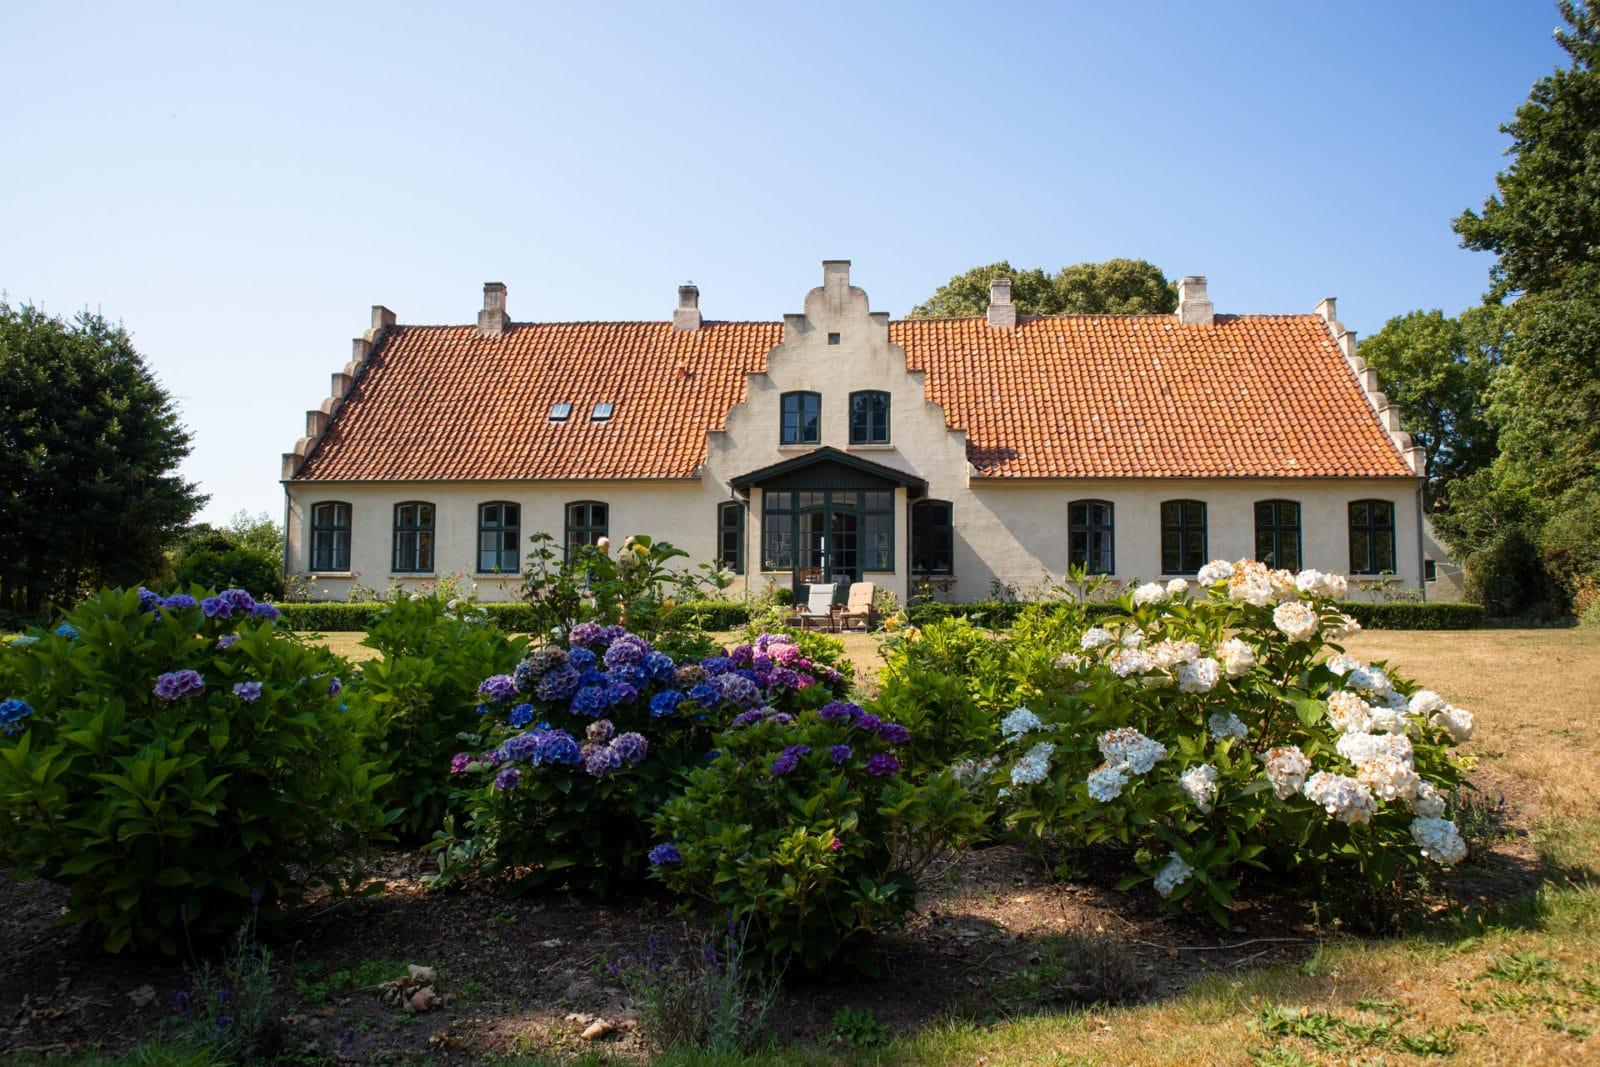 Præstegård, Onsbjerg